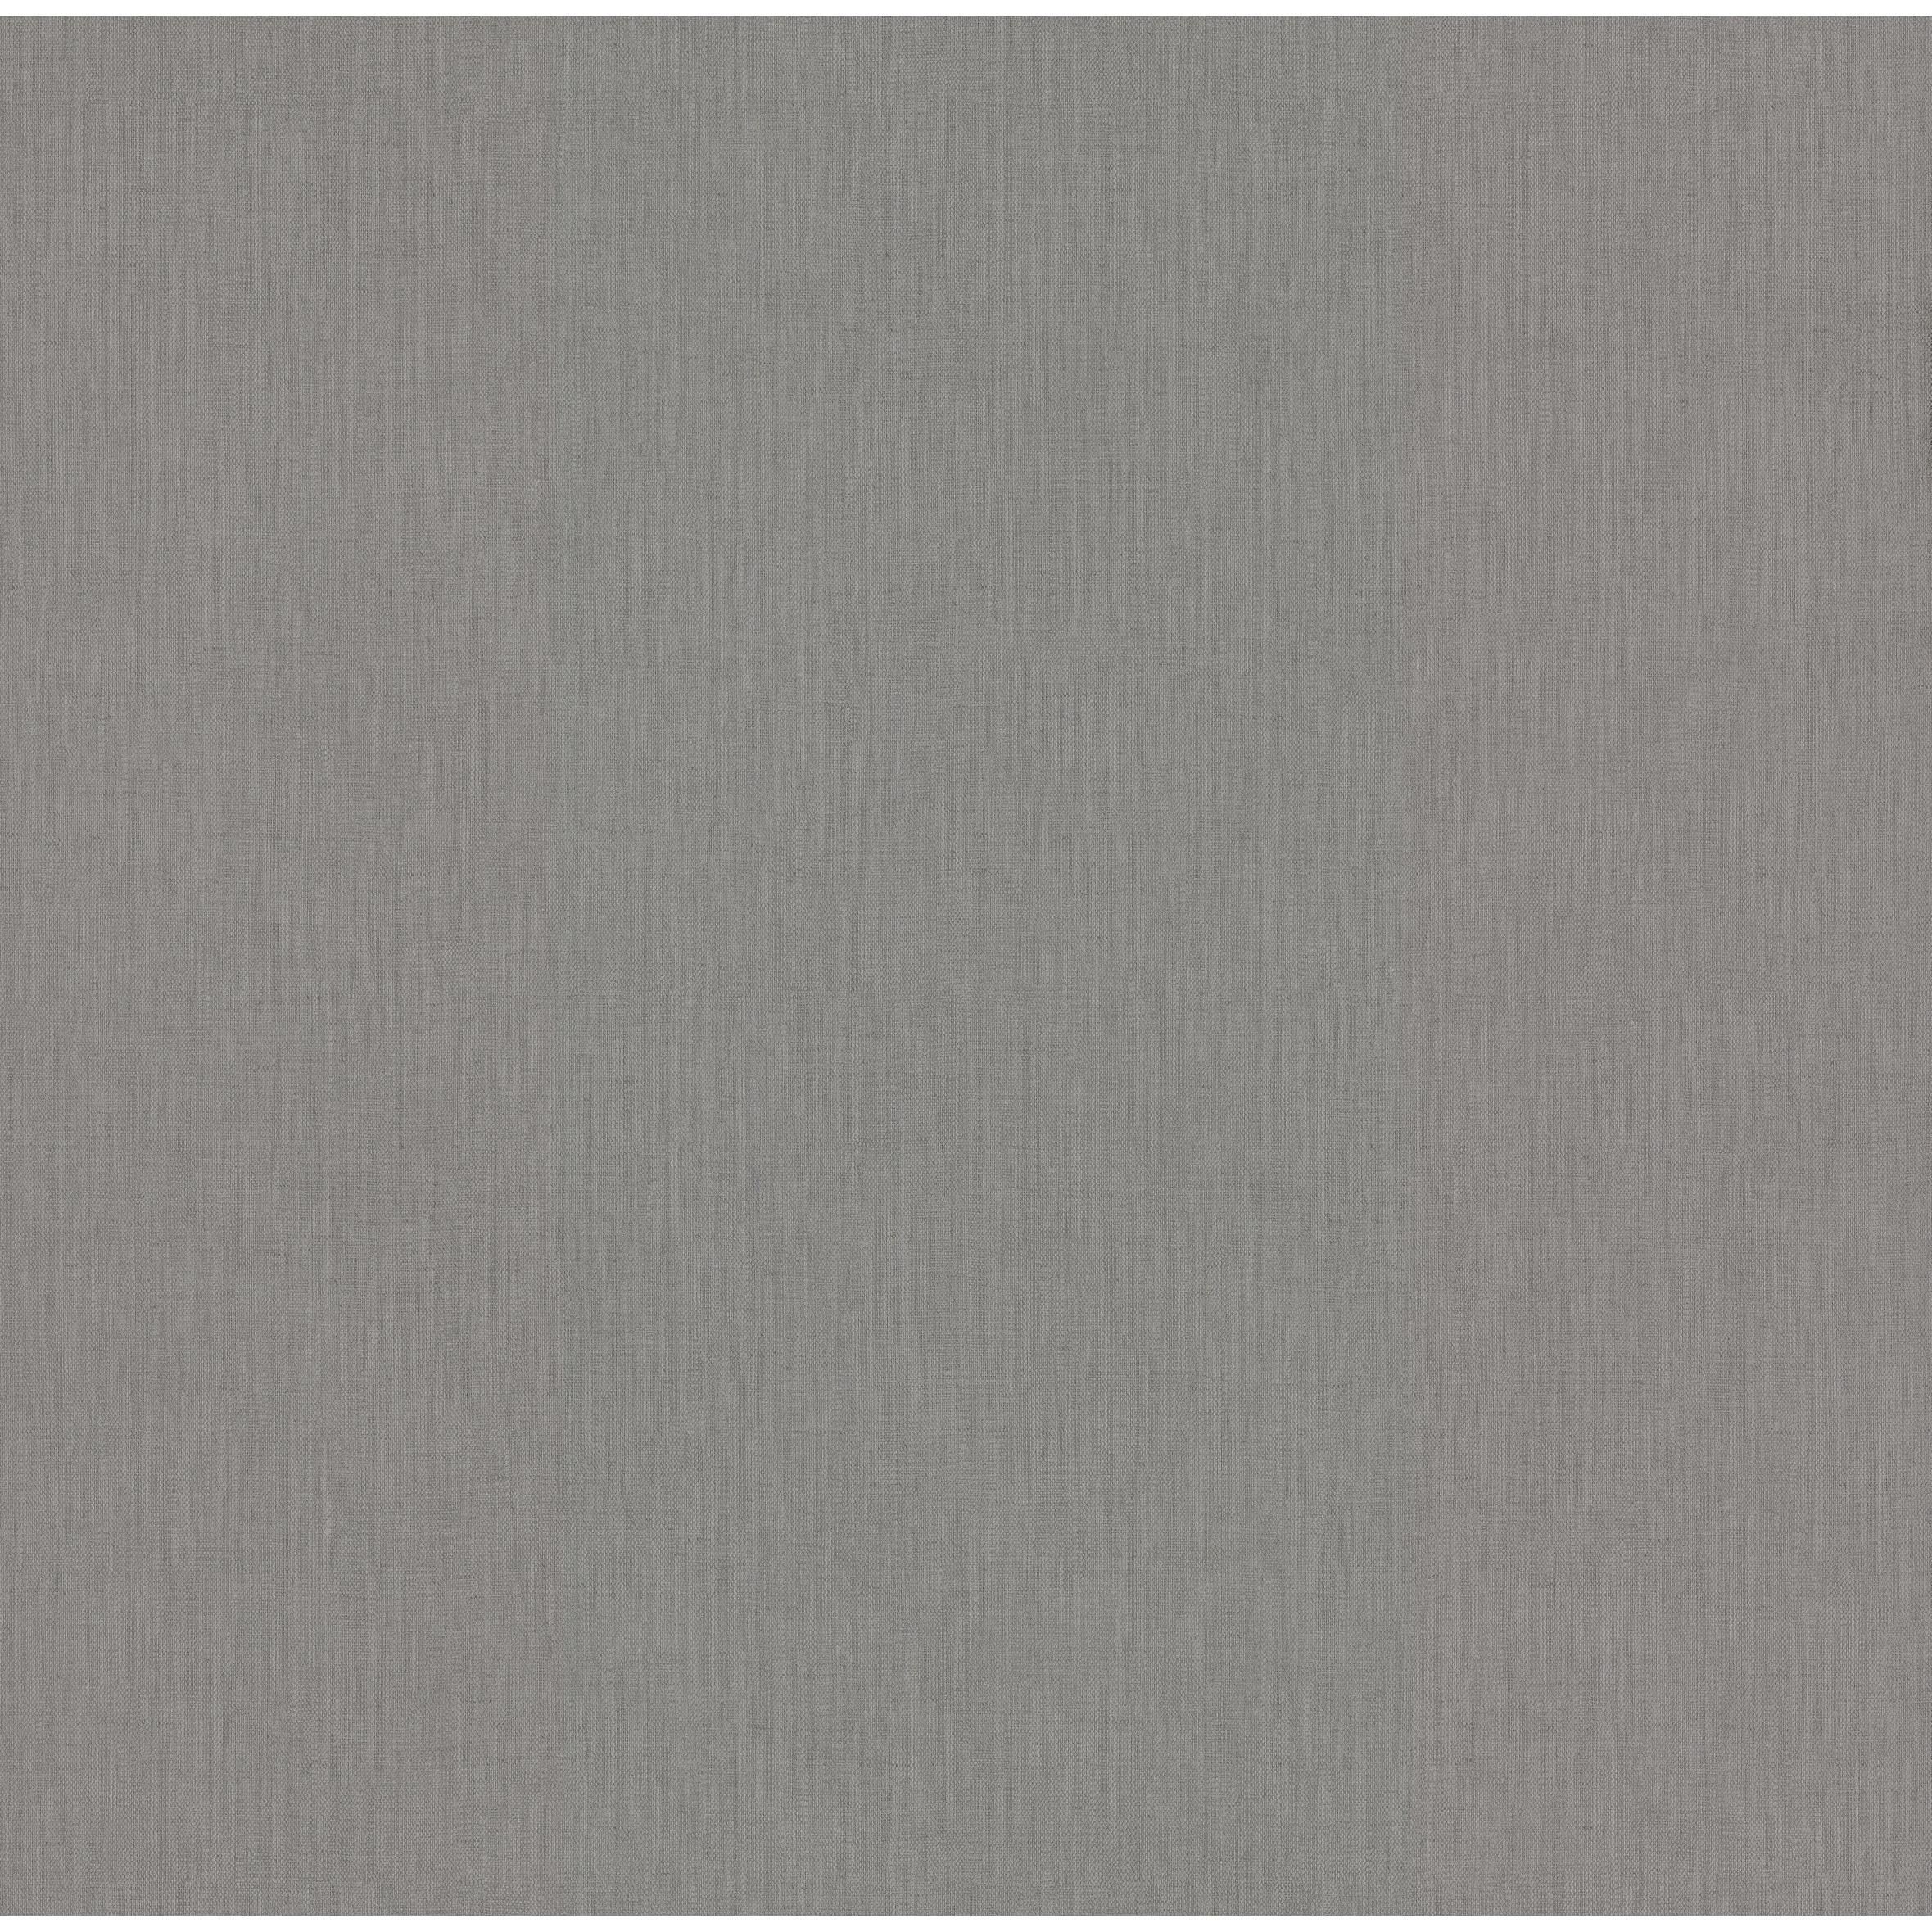 Shop Pasadena Garment Gray Wallpaper Overstock 31593103